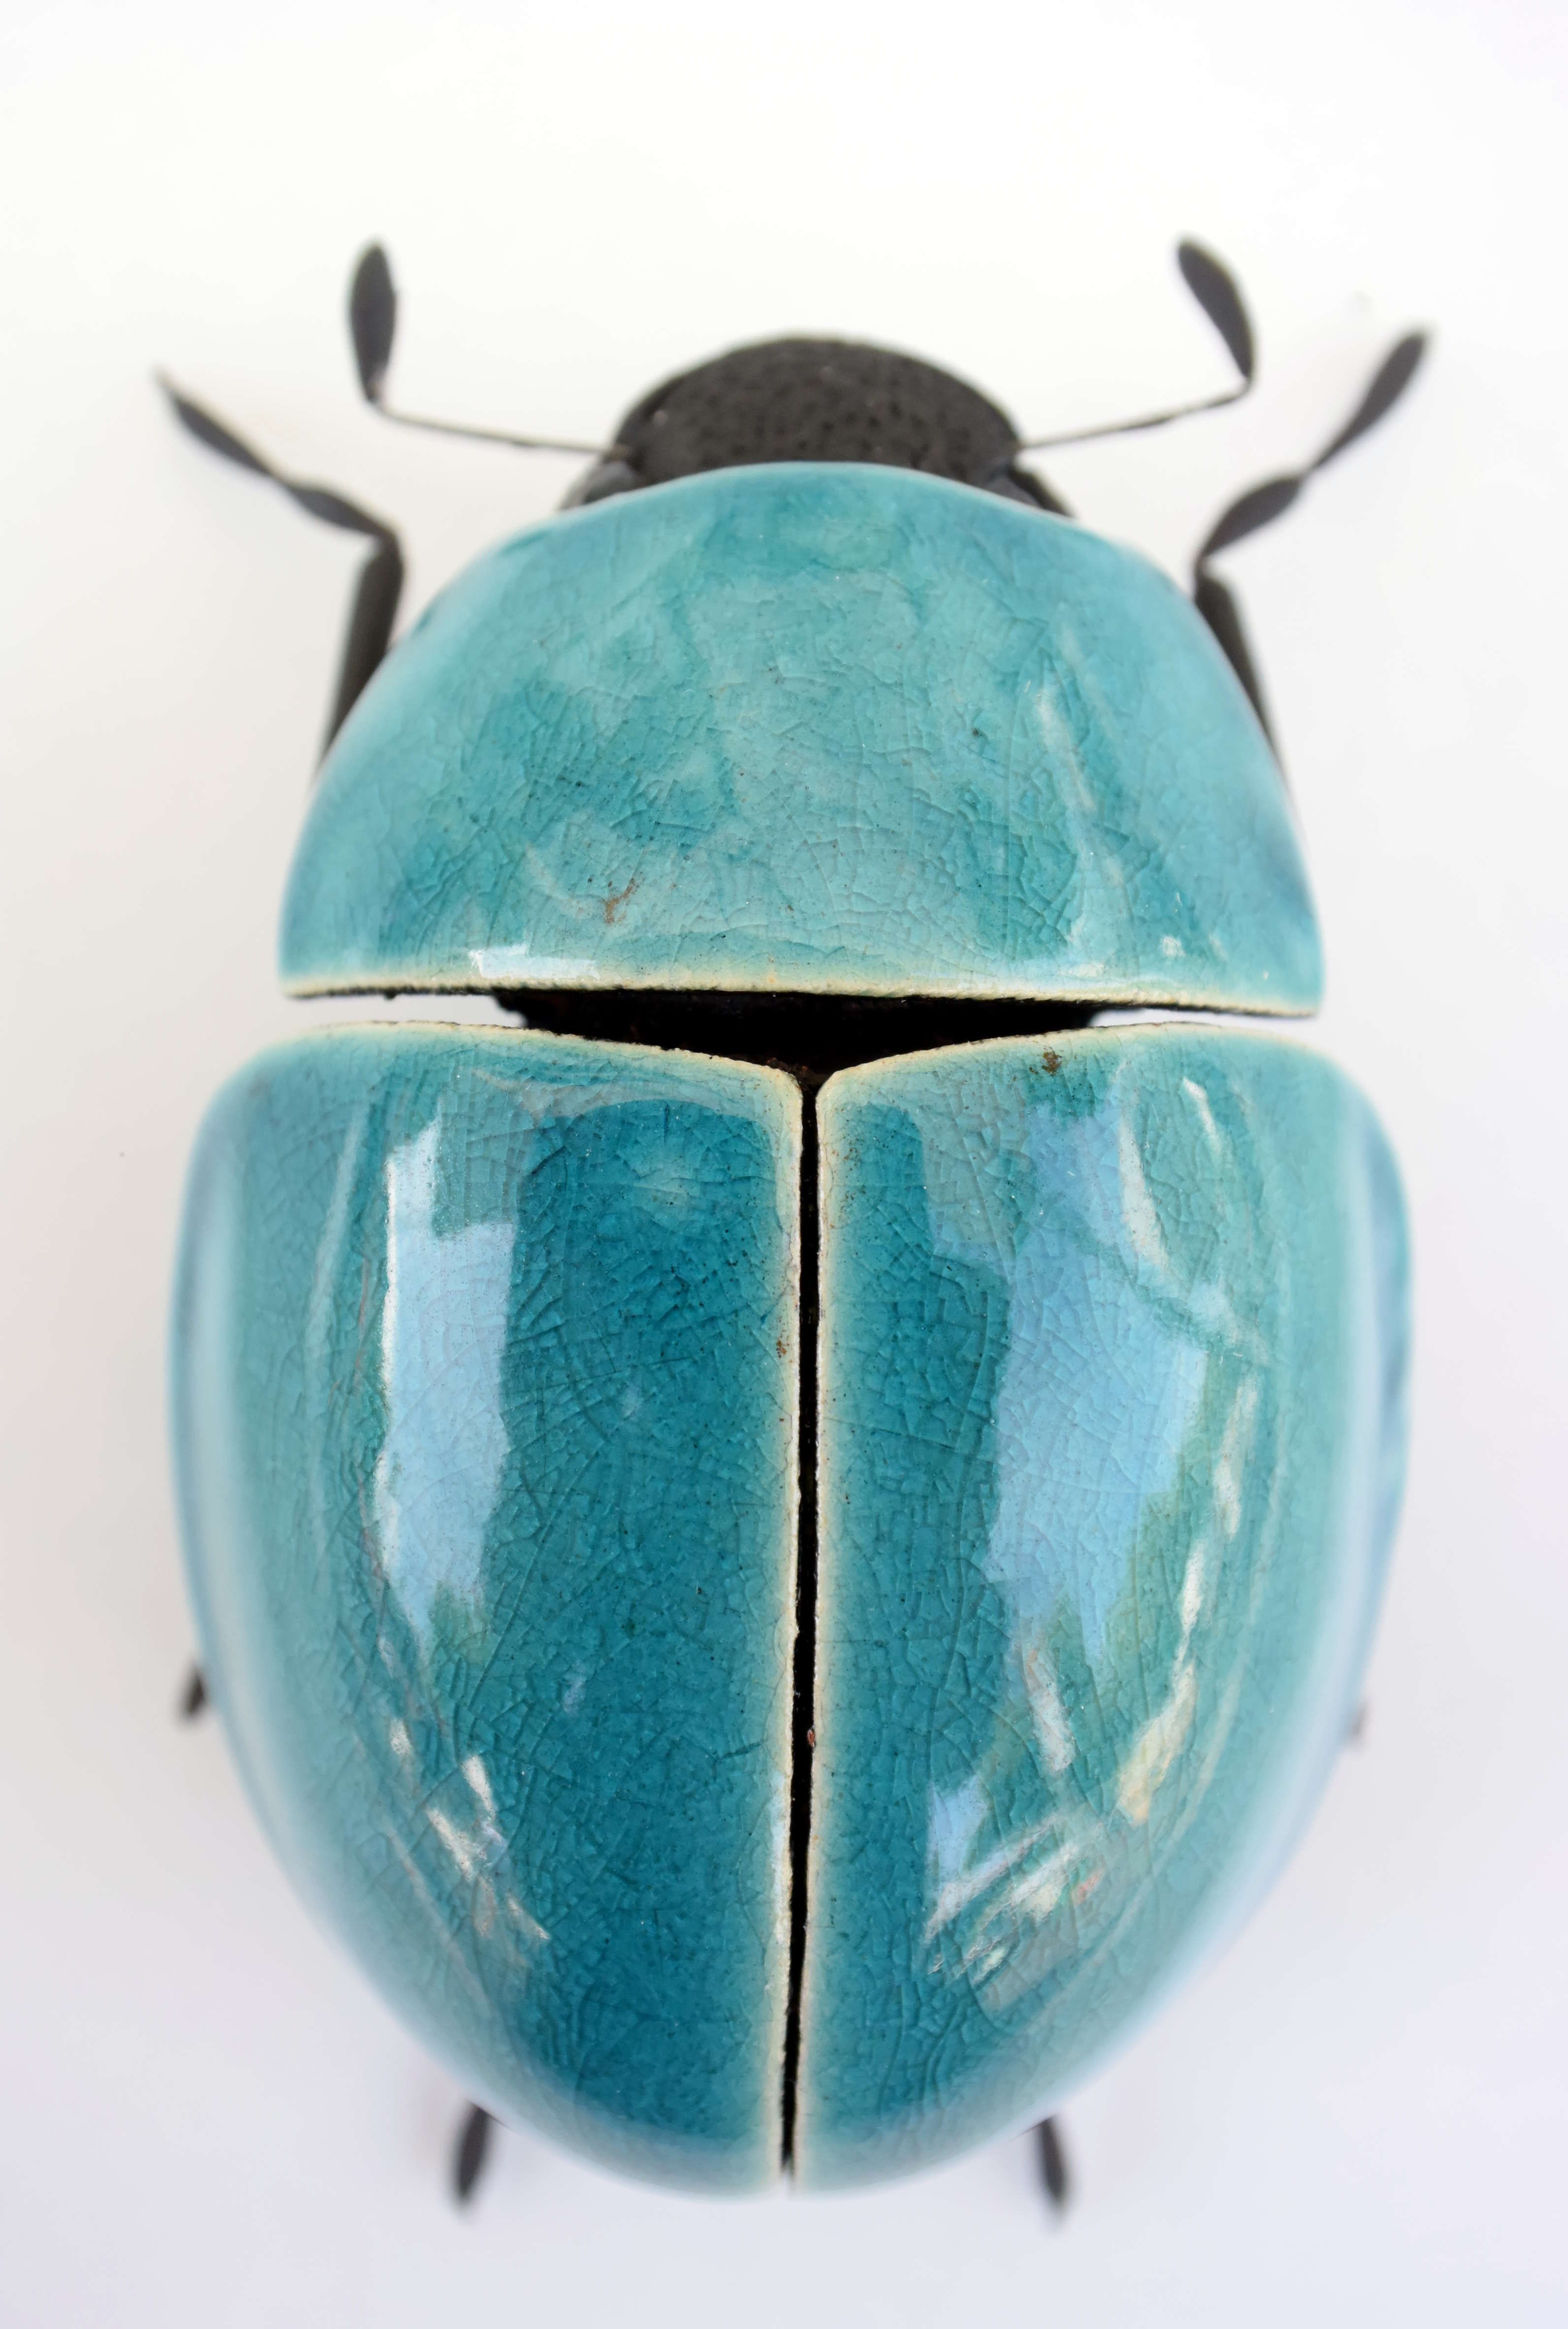 Page Ross De Wayne Keramik Insektenkunst Insekten Kafer Insekt